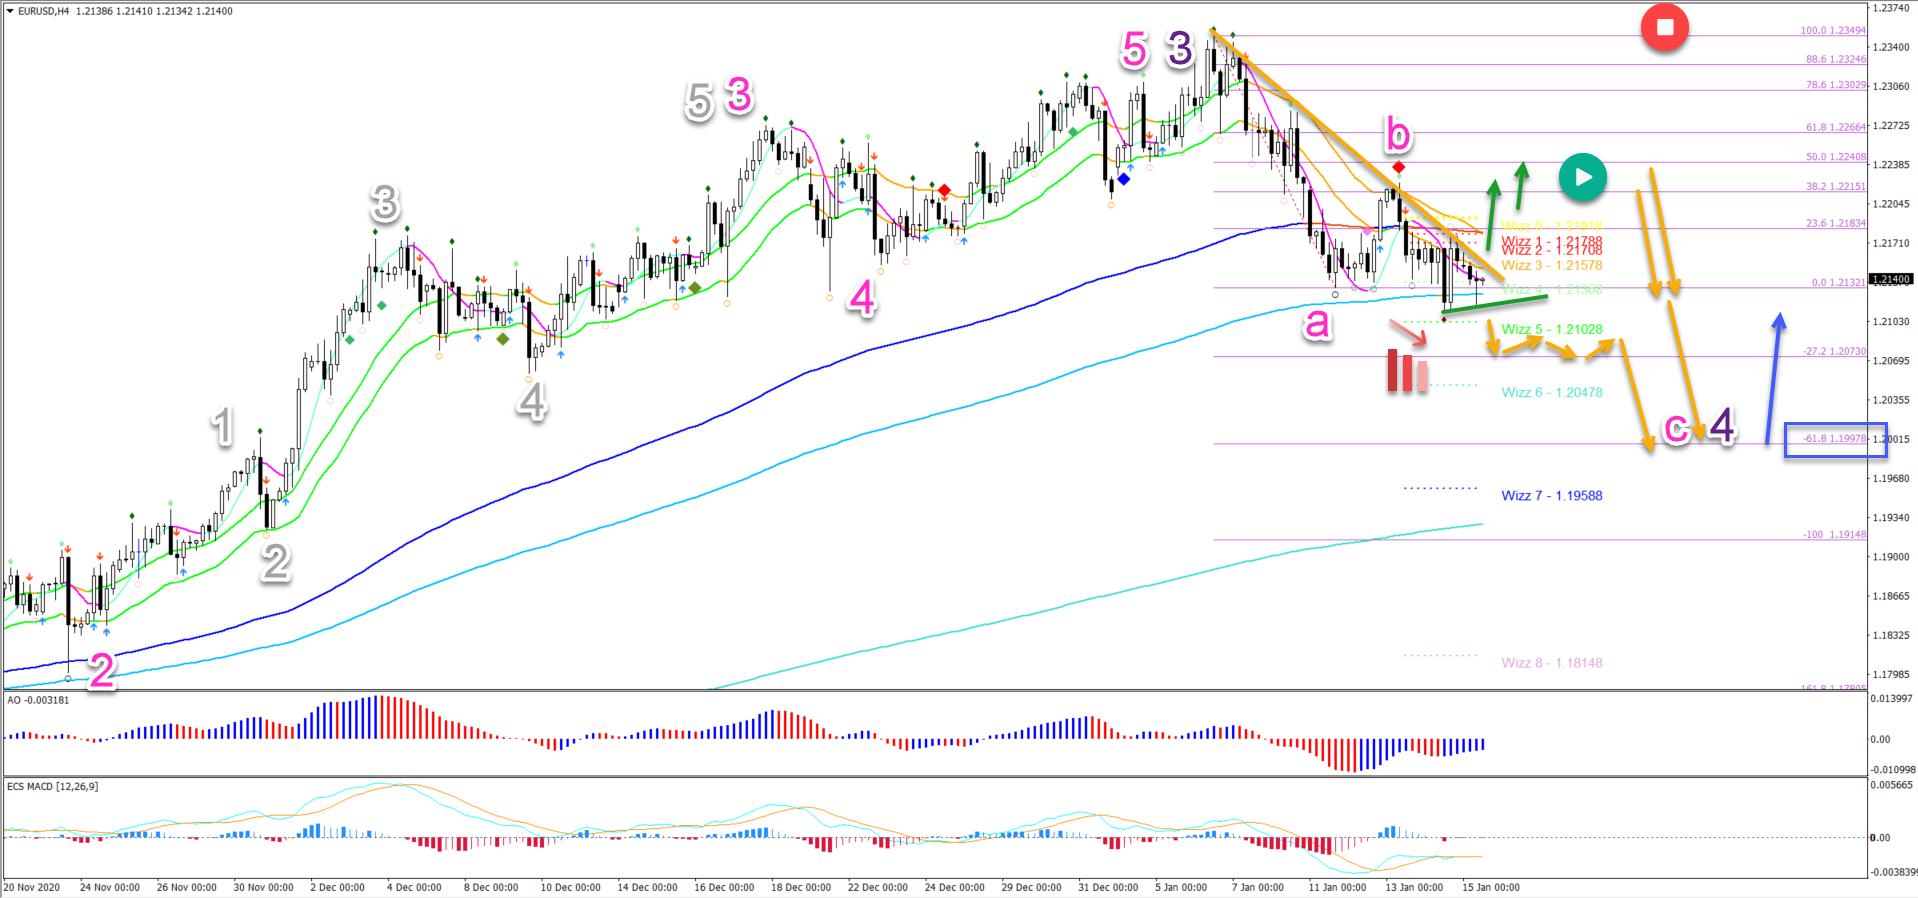 EUR/USD 15.01.2021 4 hour chart